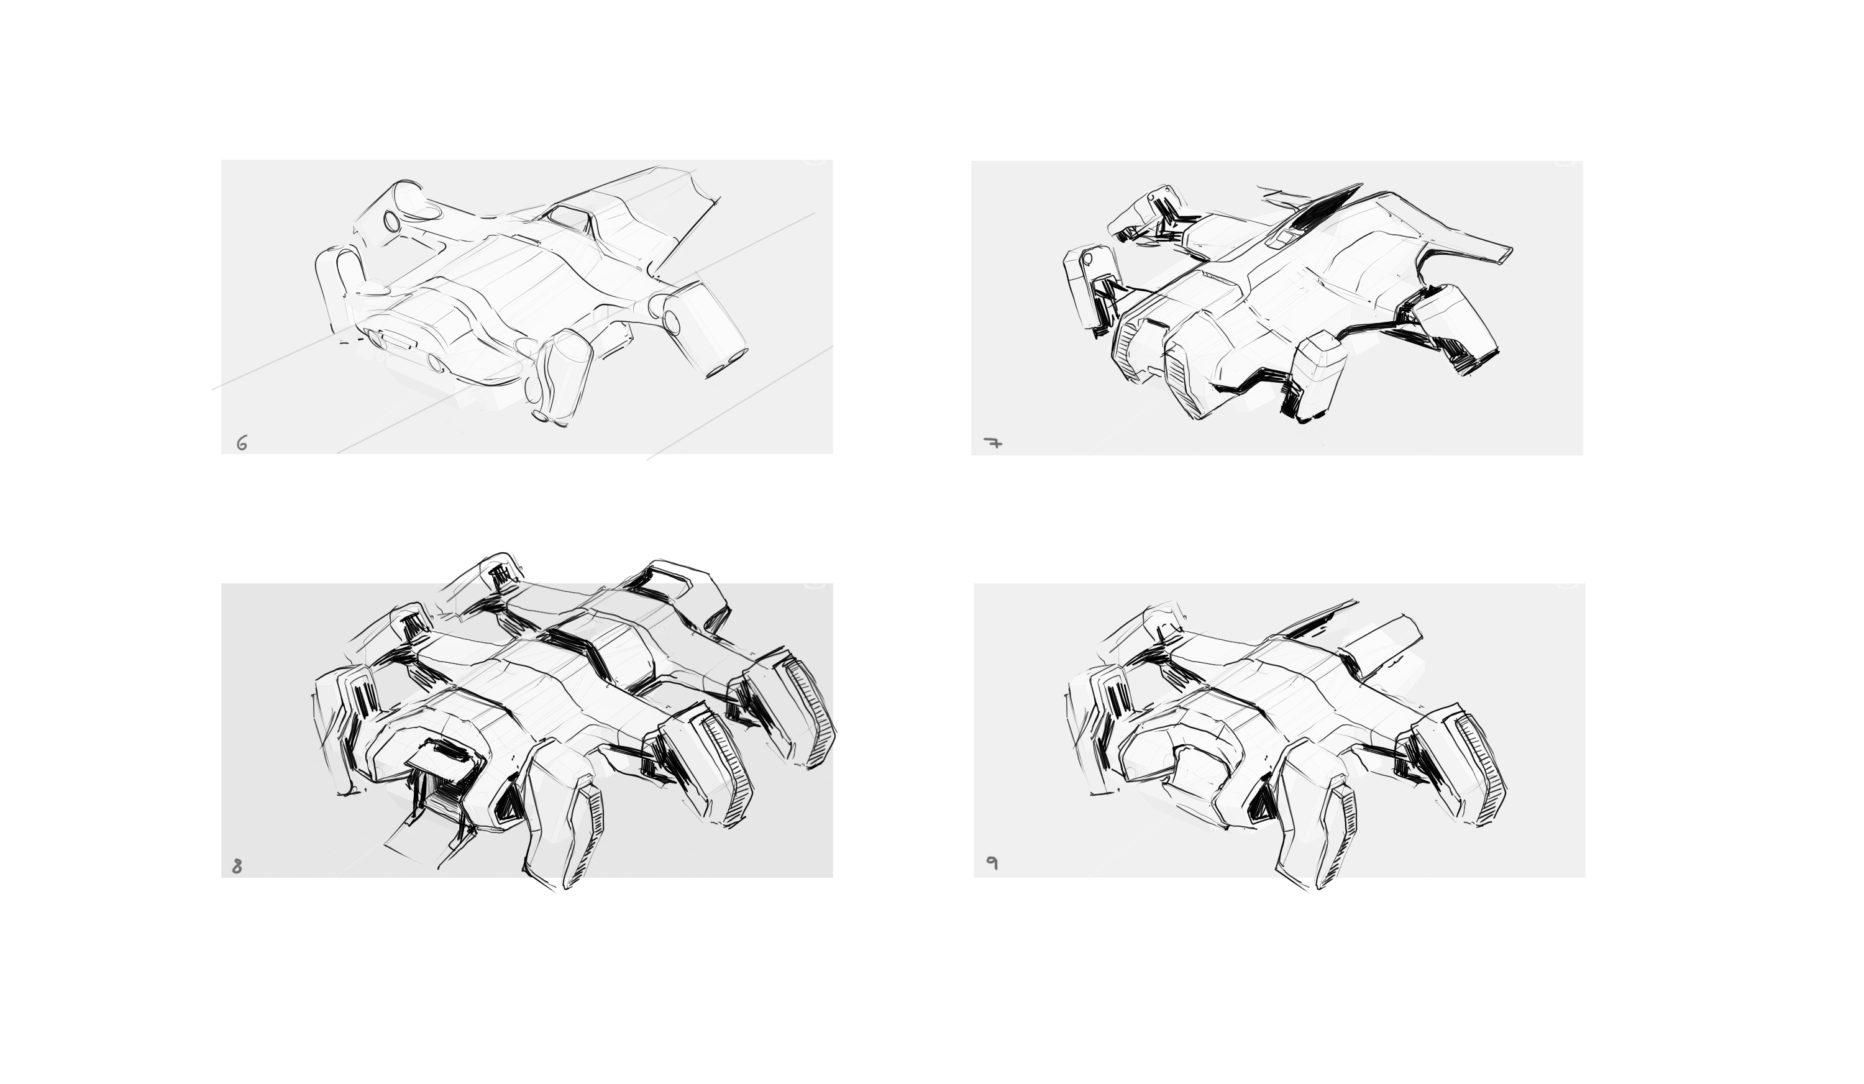 SC-Hercules-Concept-Art-6.jpg